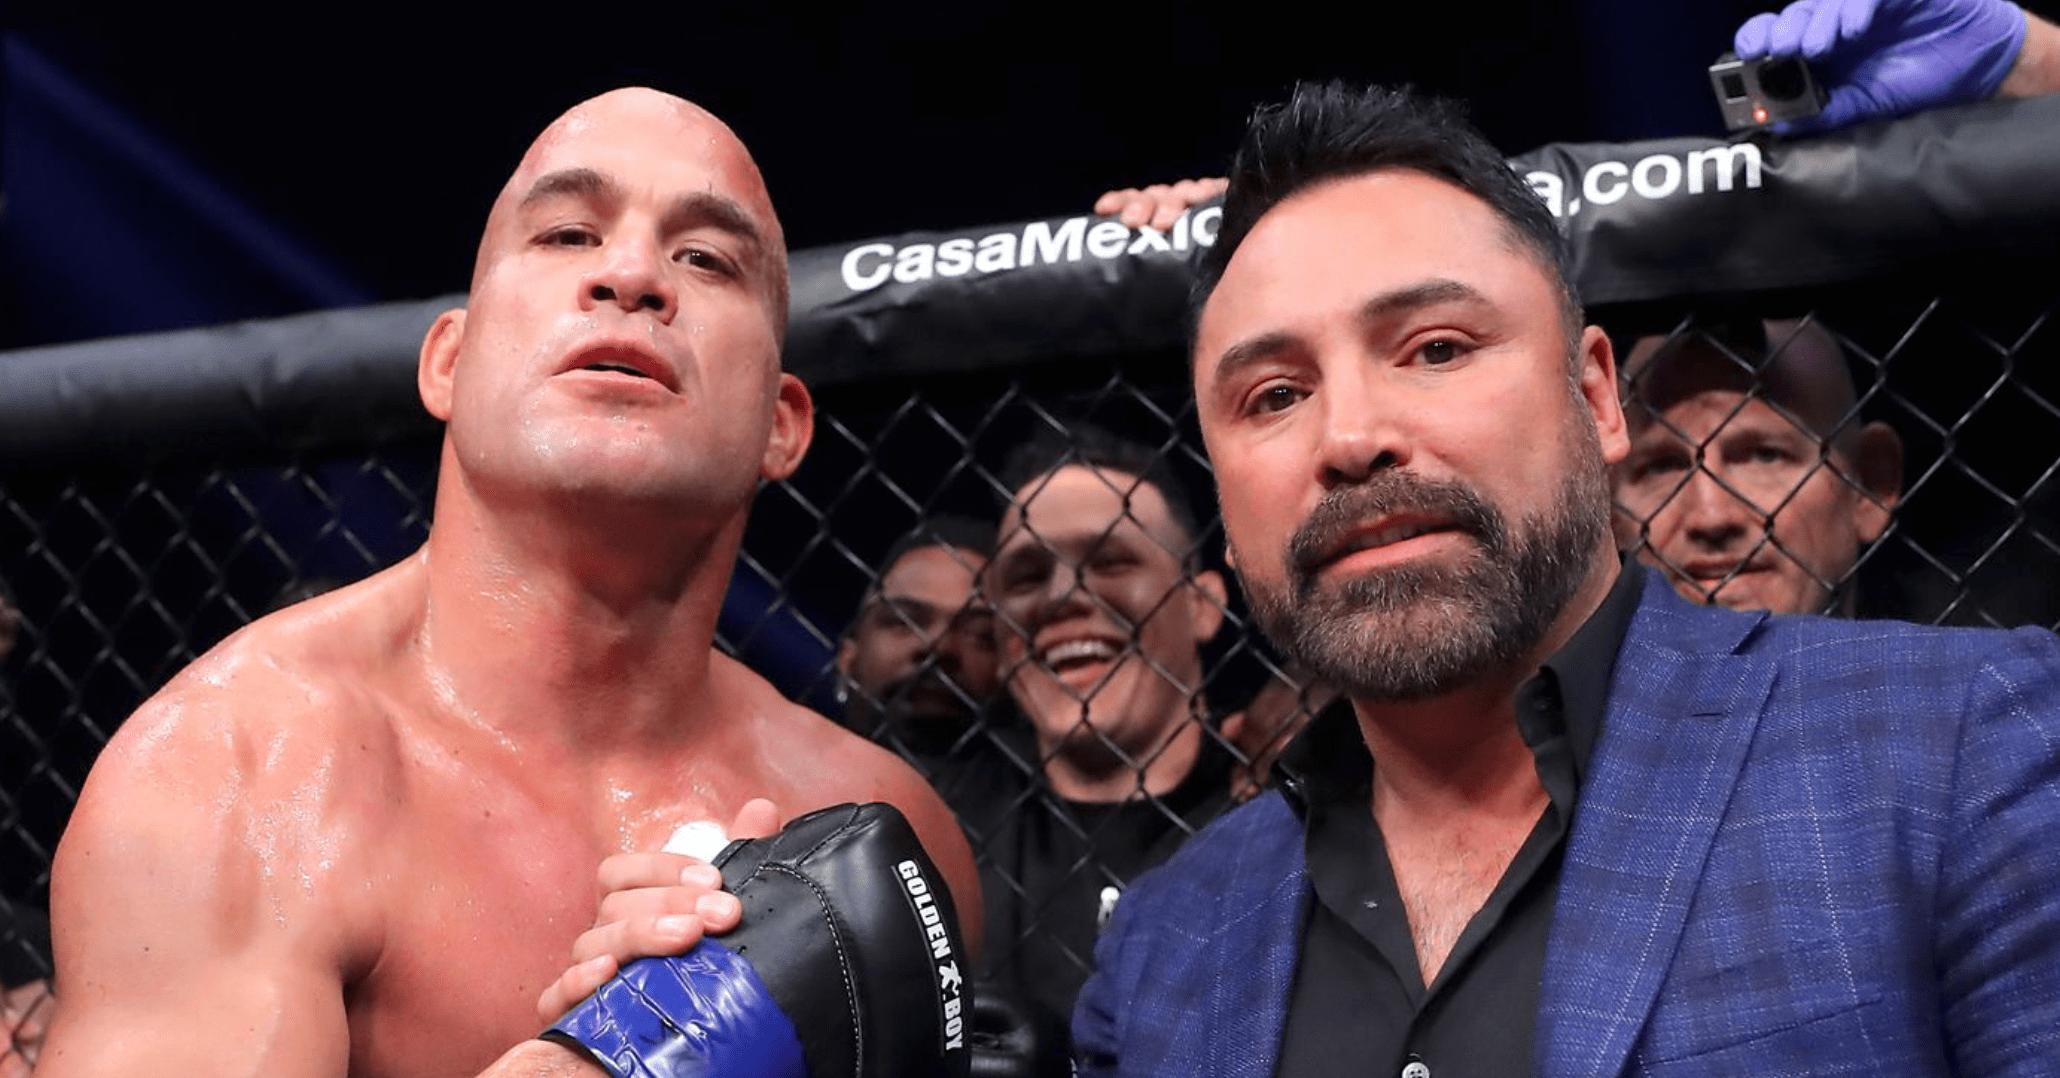 Tito Ortiz Provides Update On Golden Boy MMA, Talks About Dana White